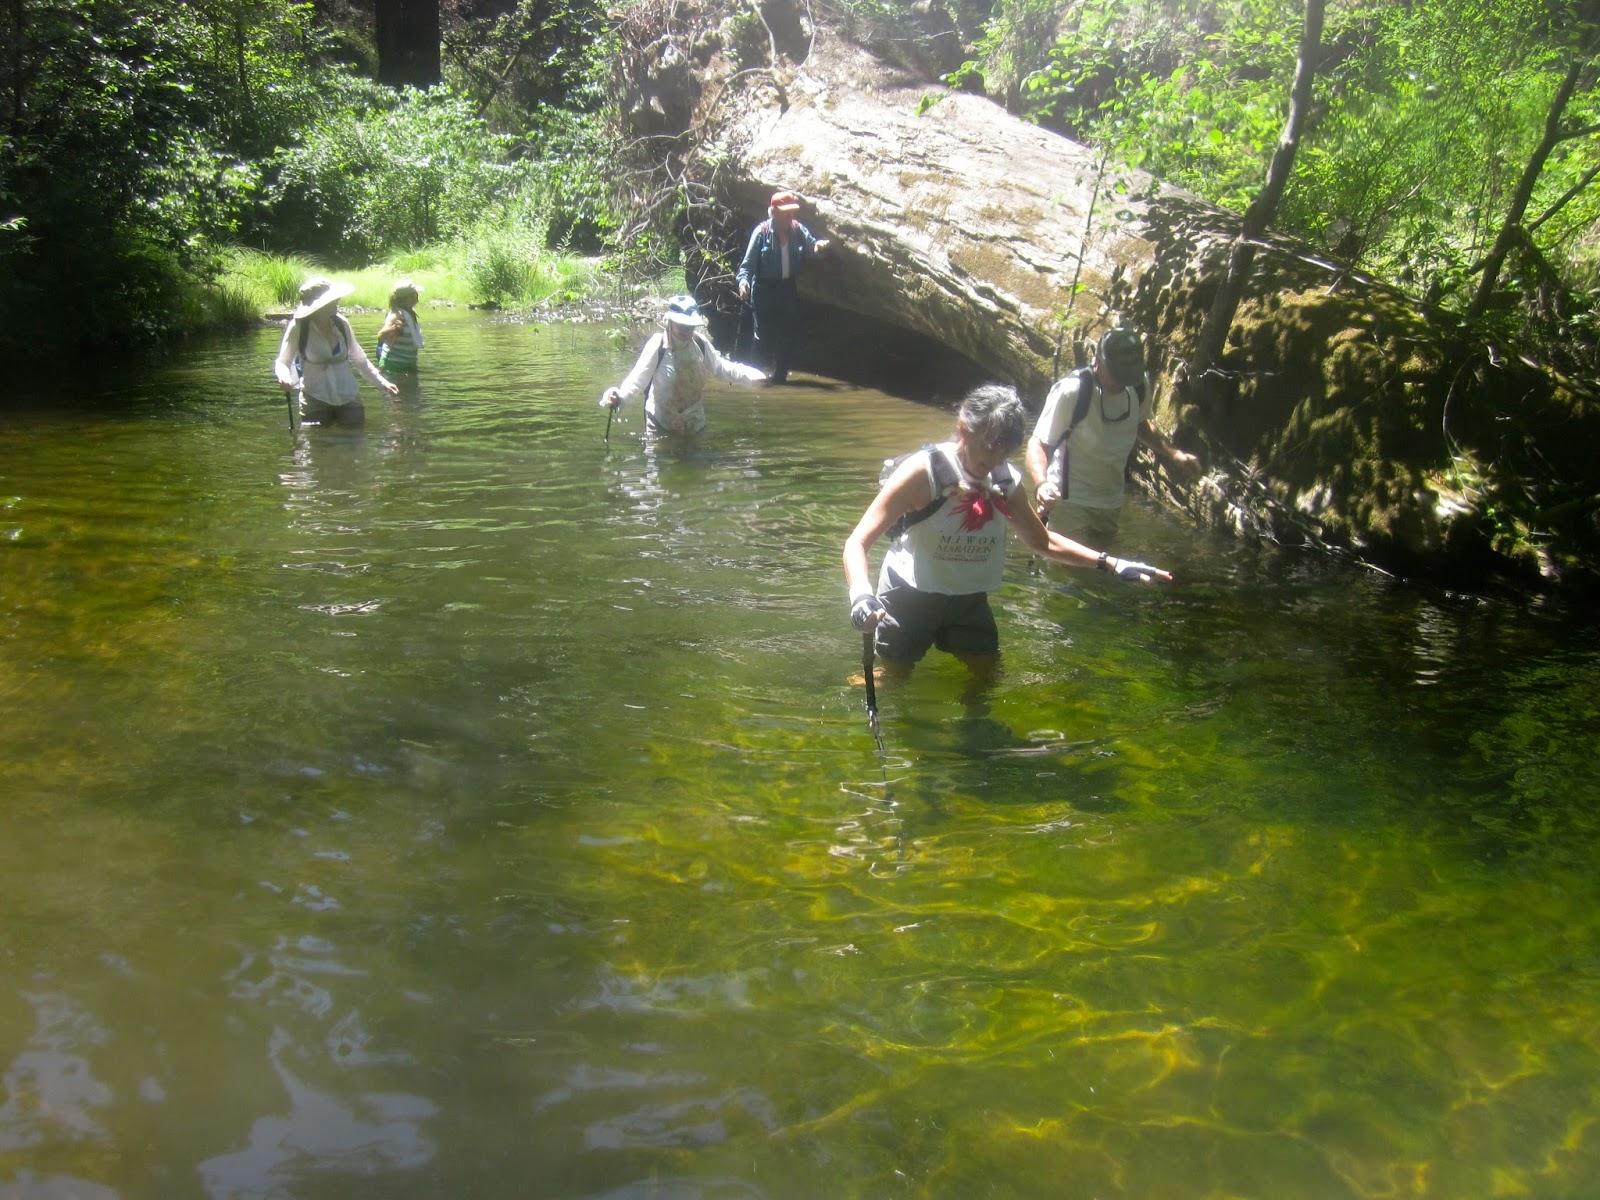 California san mateo county pescadero - Creek Freaking In Pescadero Creek